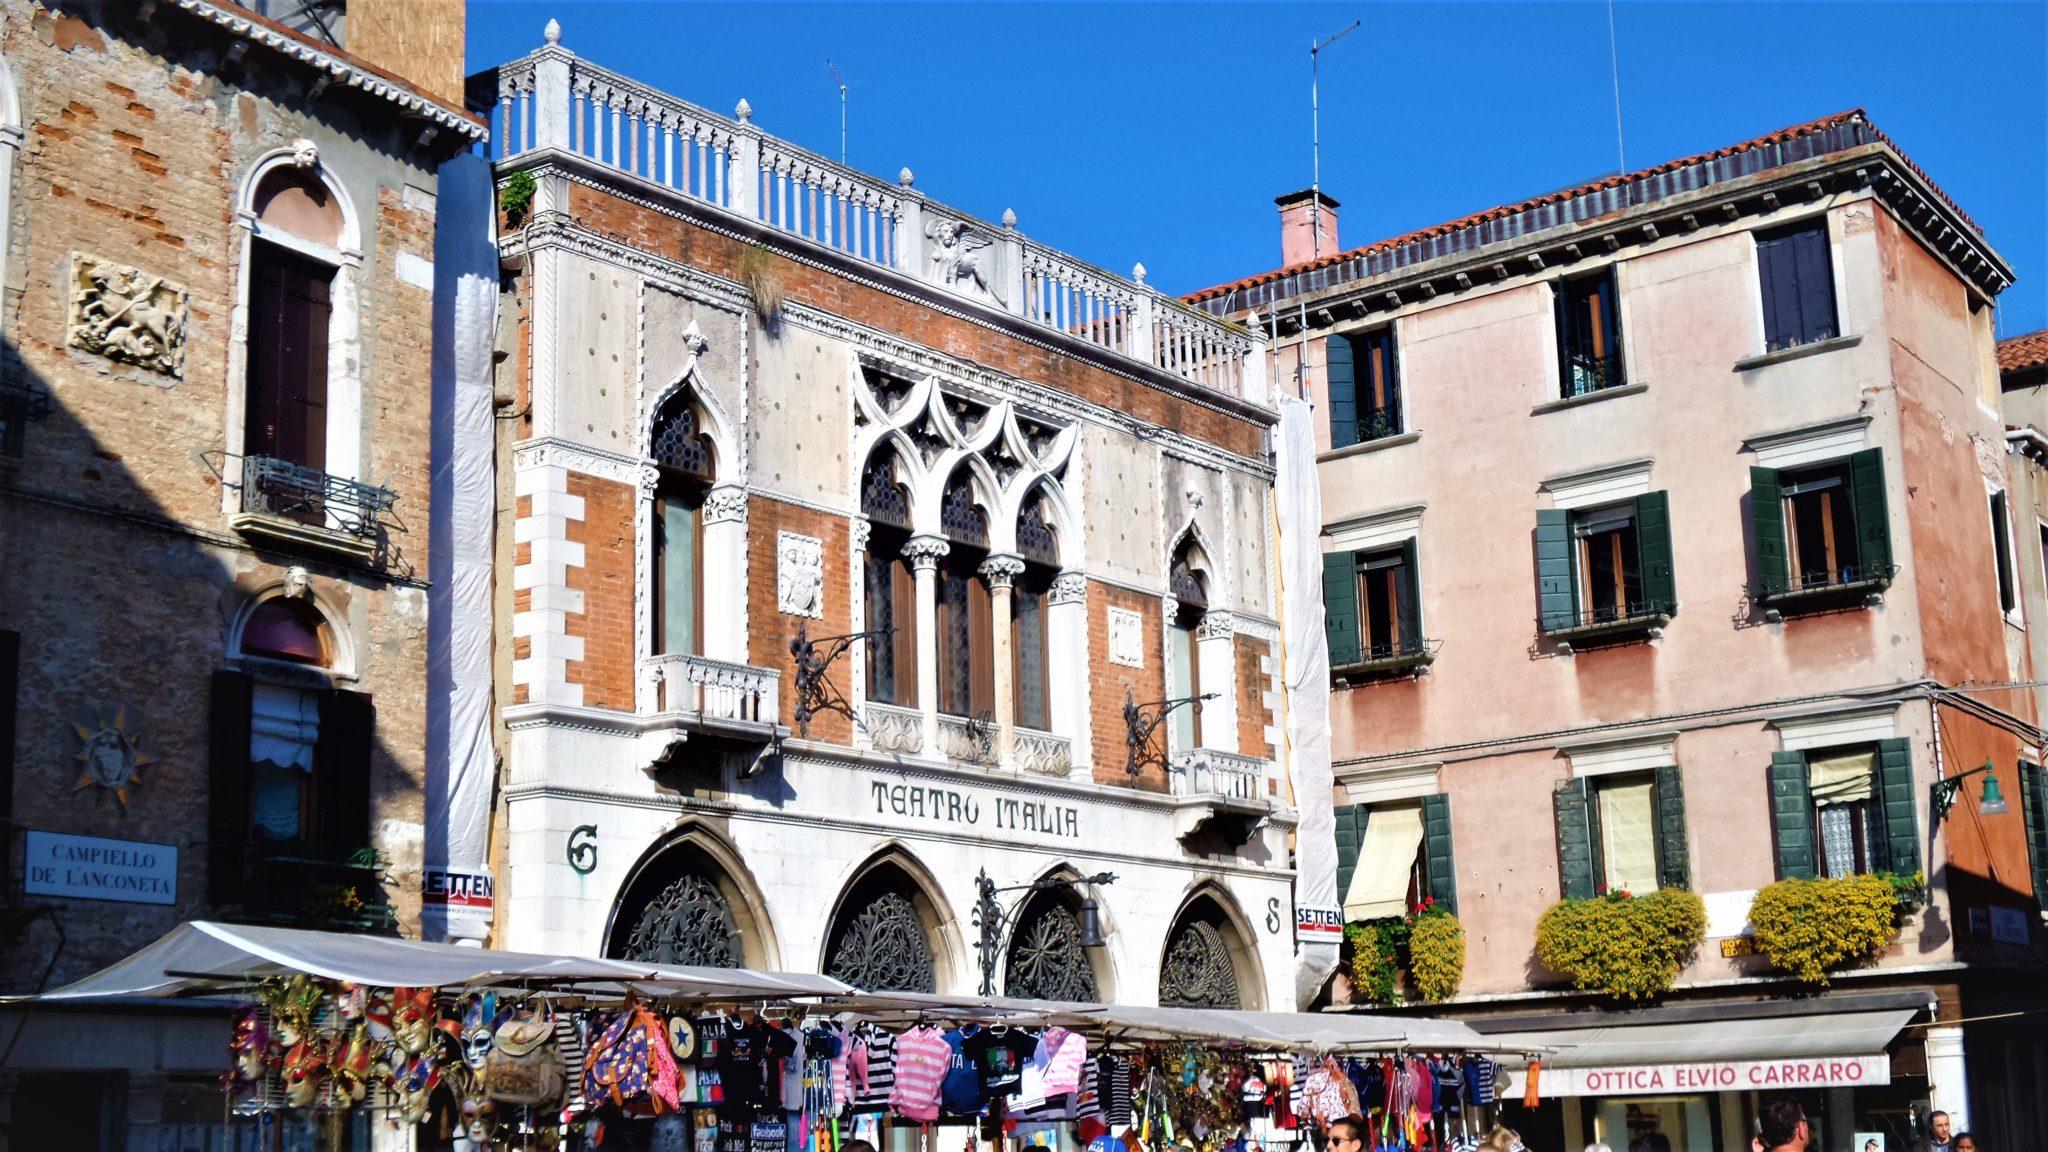 Teatro Italia, Venice, Italy